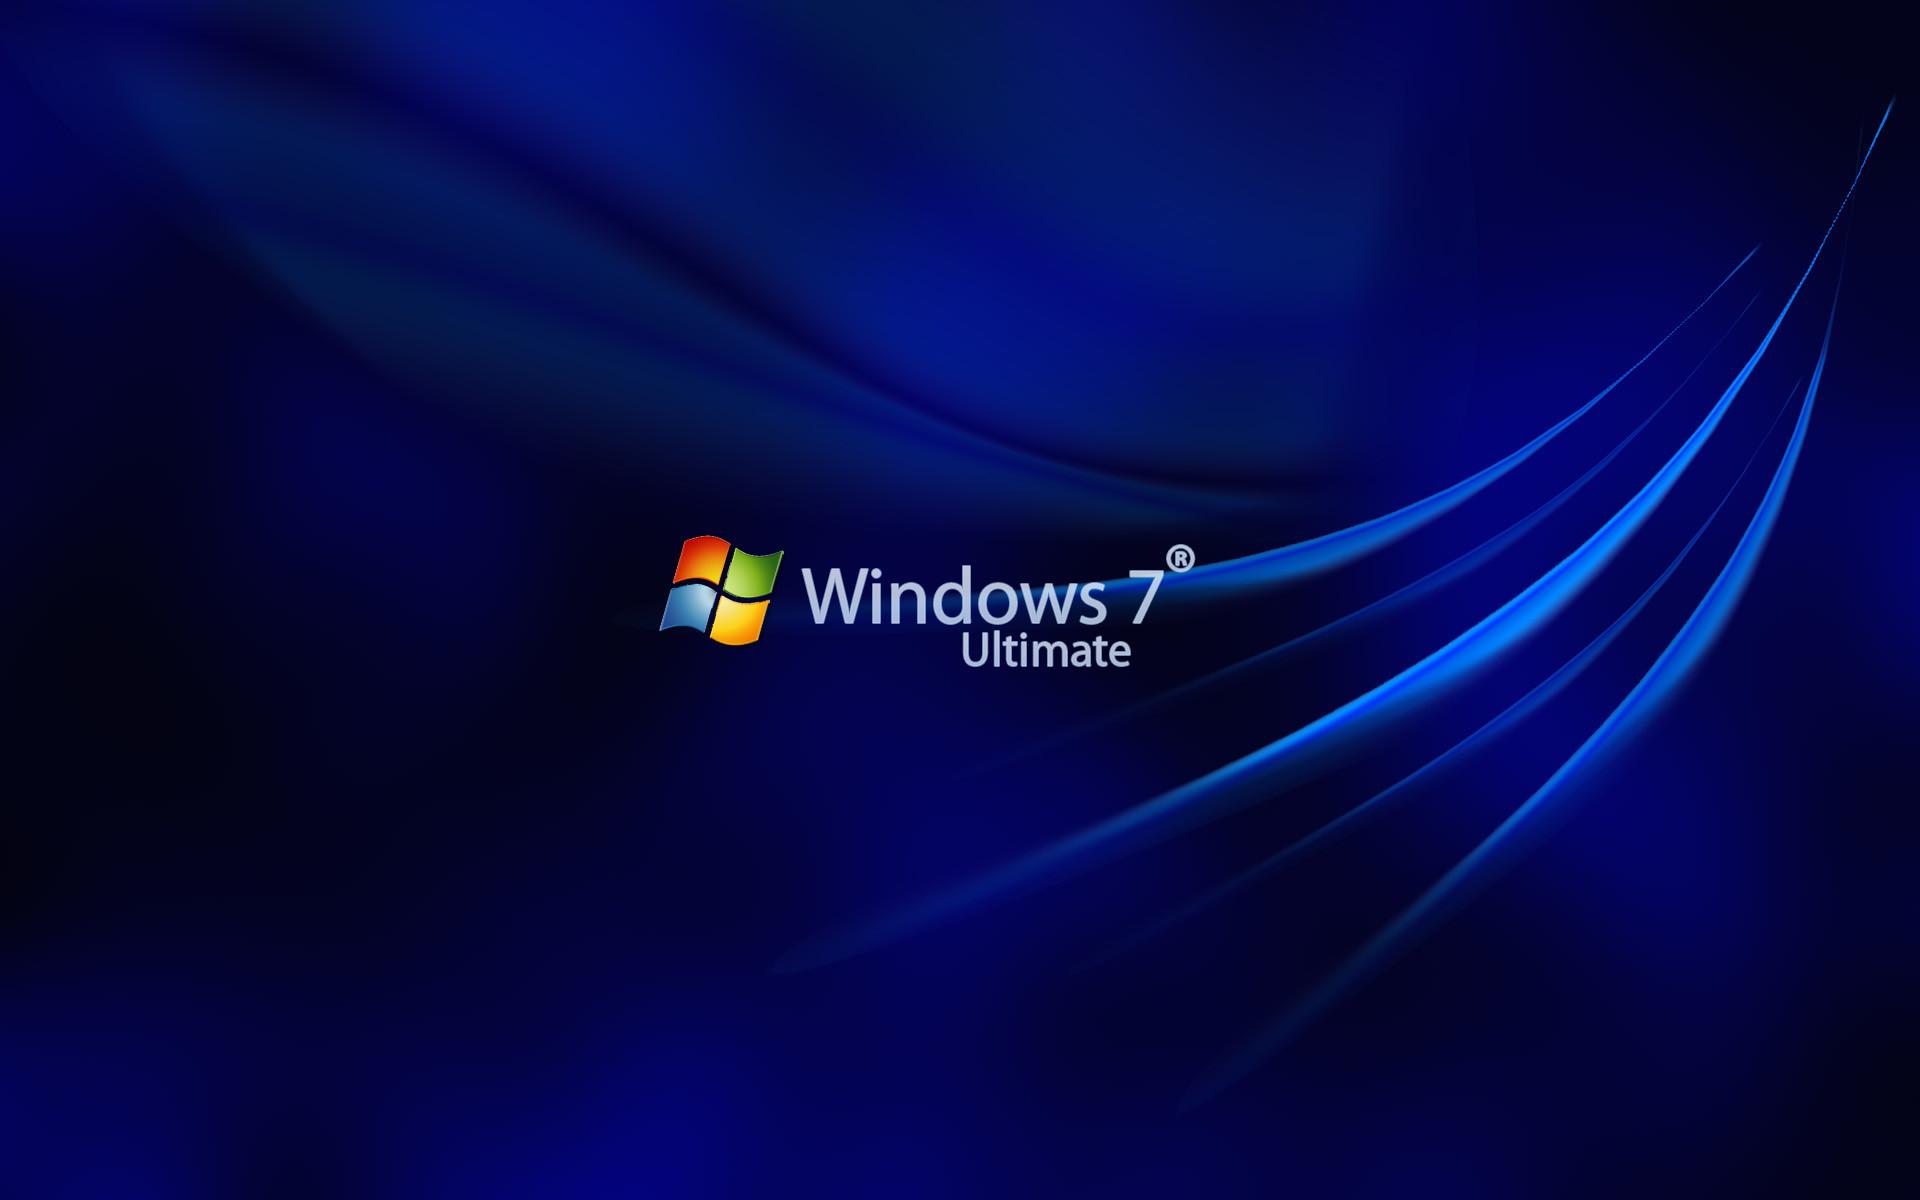 60 Hd Windows 7 Wallpaper On Wallpapersafari